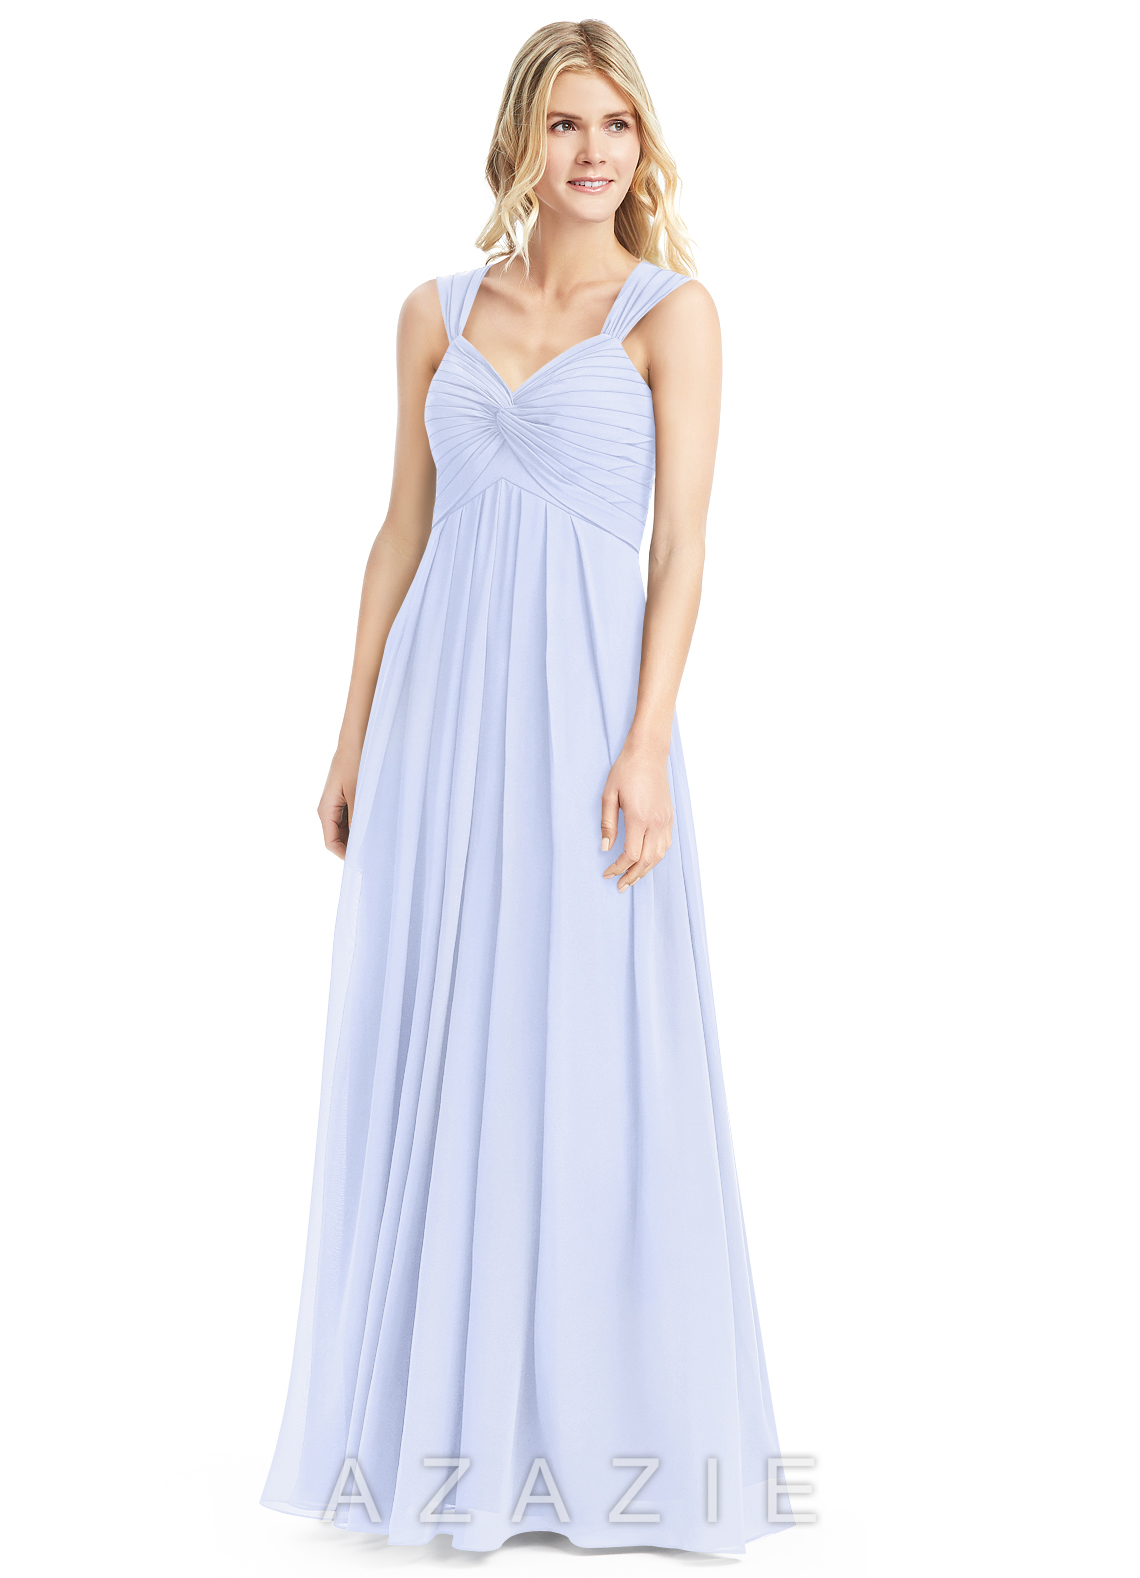 Lavender bridesmaid dresses lavender gowns azazie azazie kaitlynn azazie kaitlynn ombrellifo Image collections